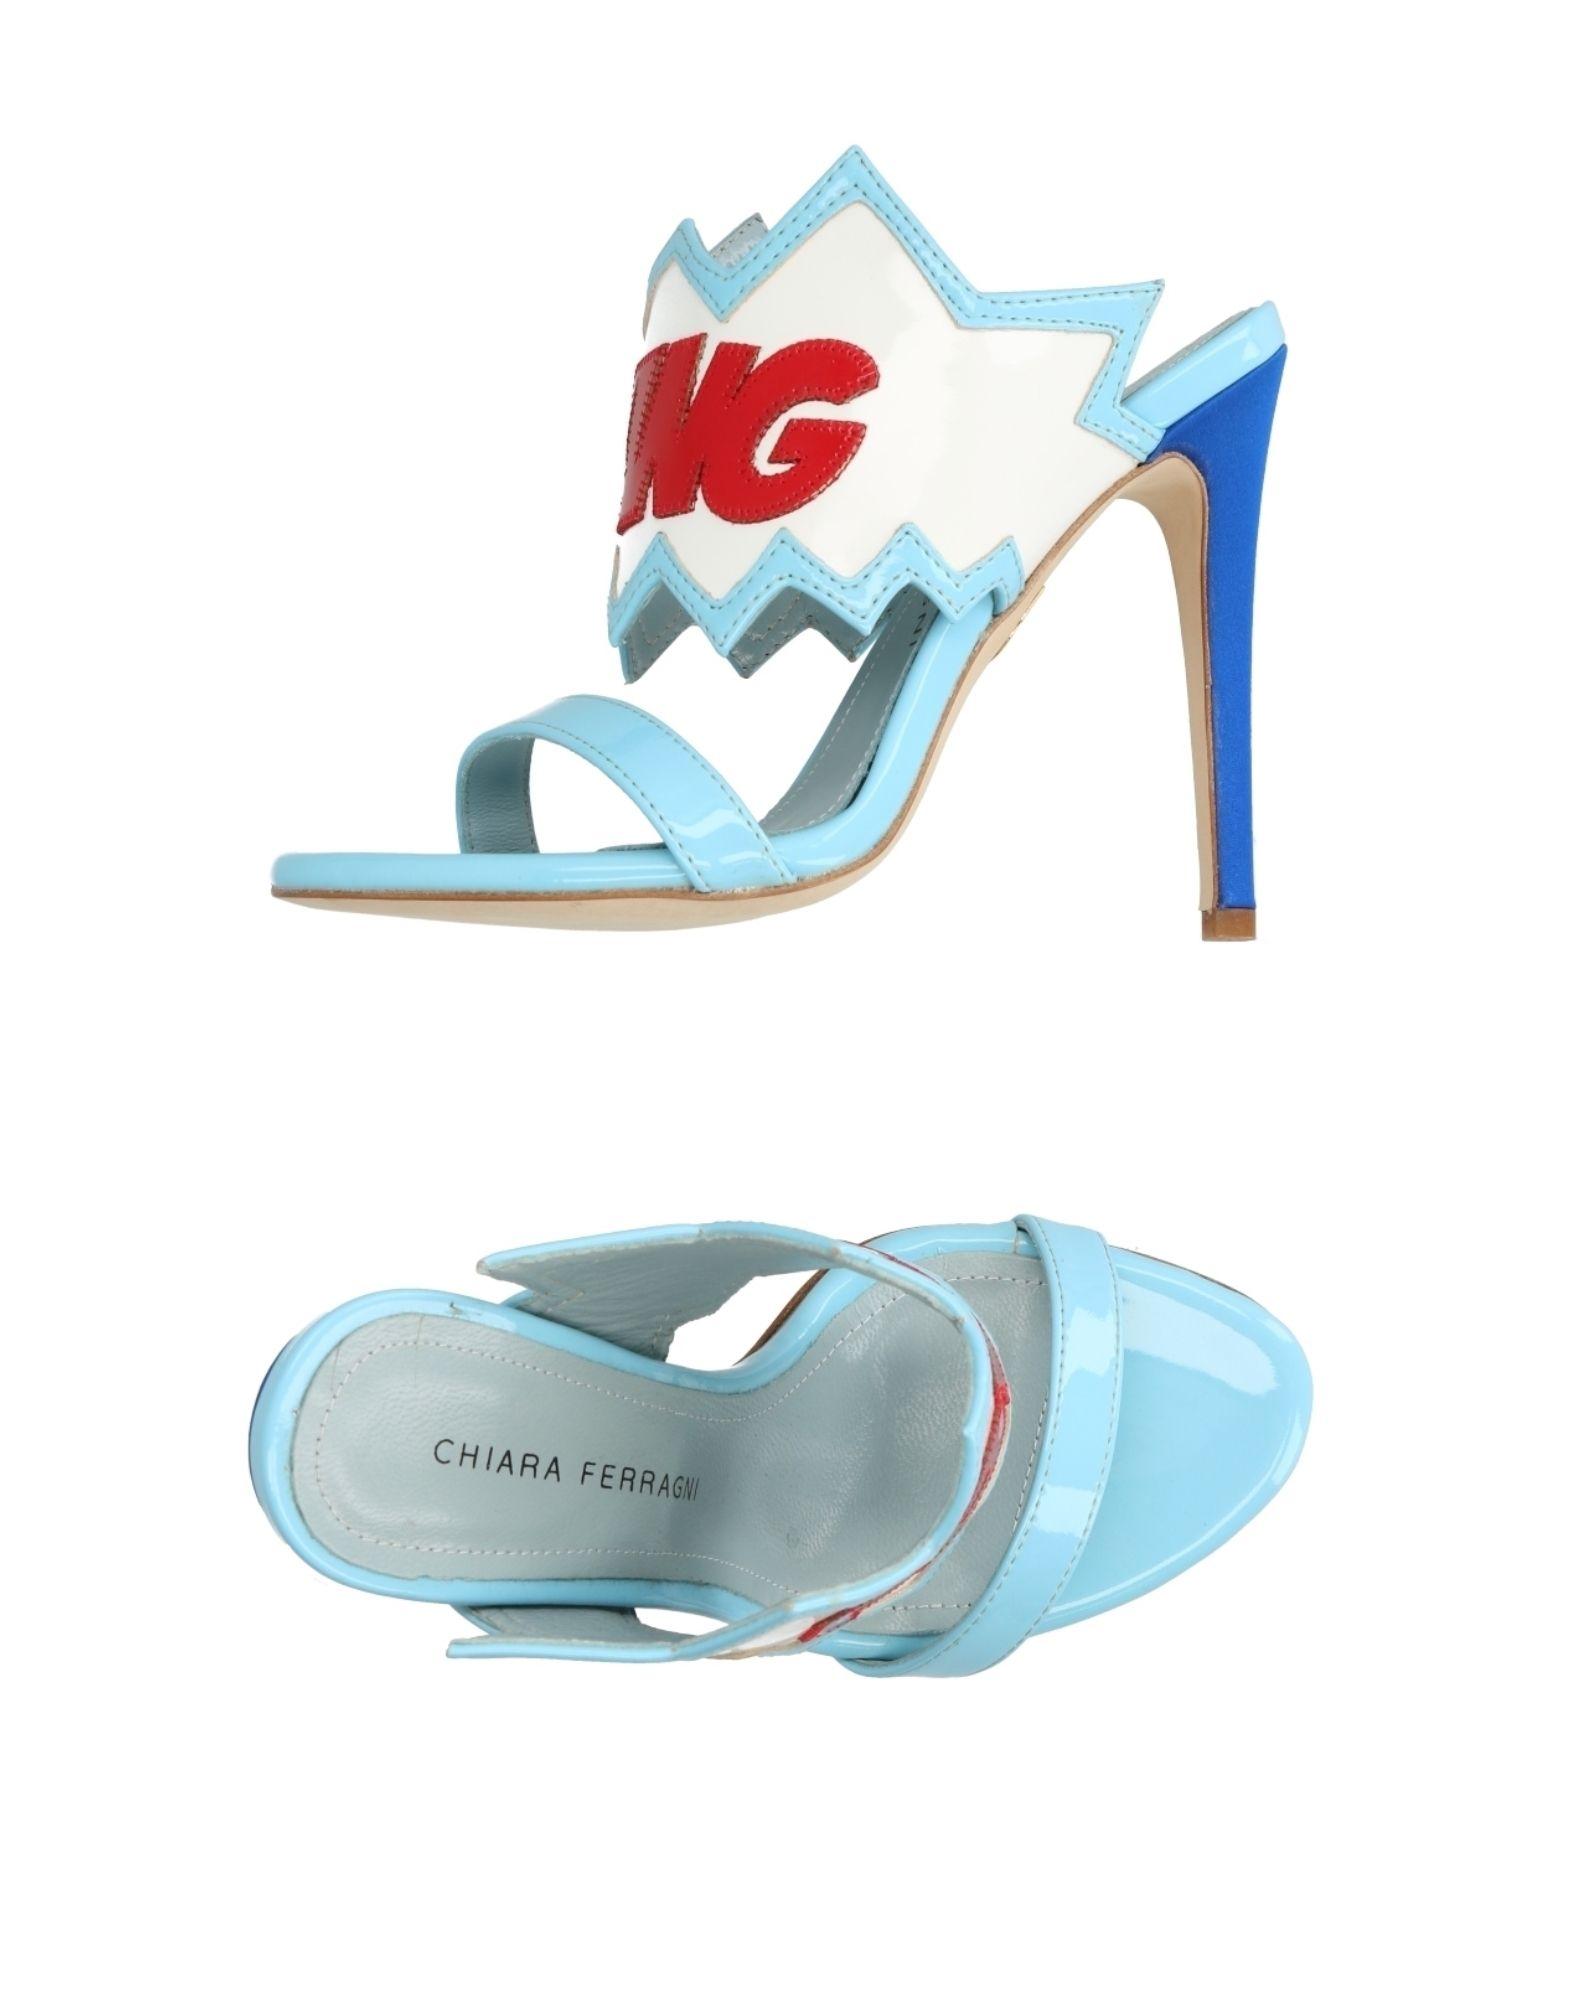 Chiara Ferragni Sandalen Damen  11278585RF Gute Qualität beliebte Schuhe